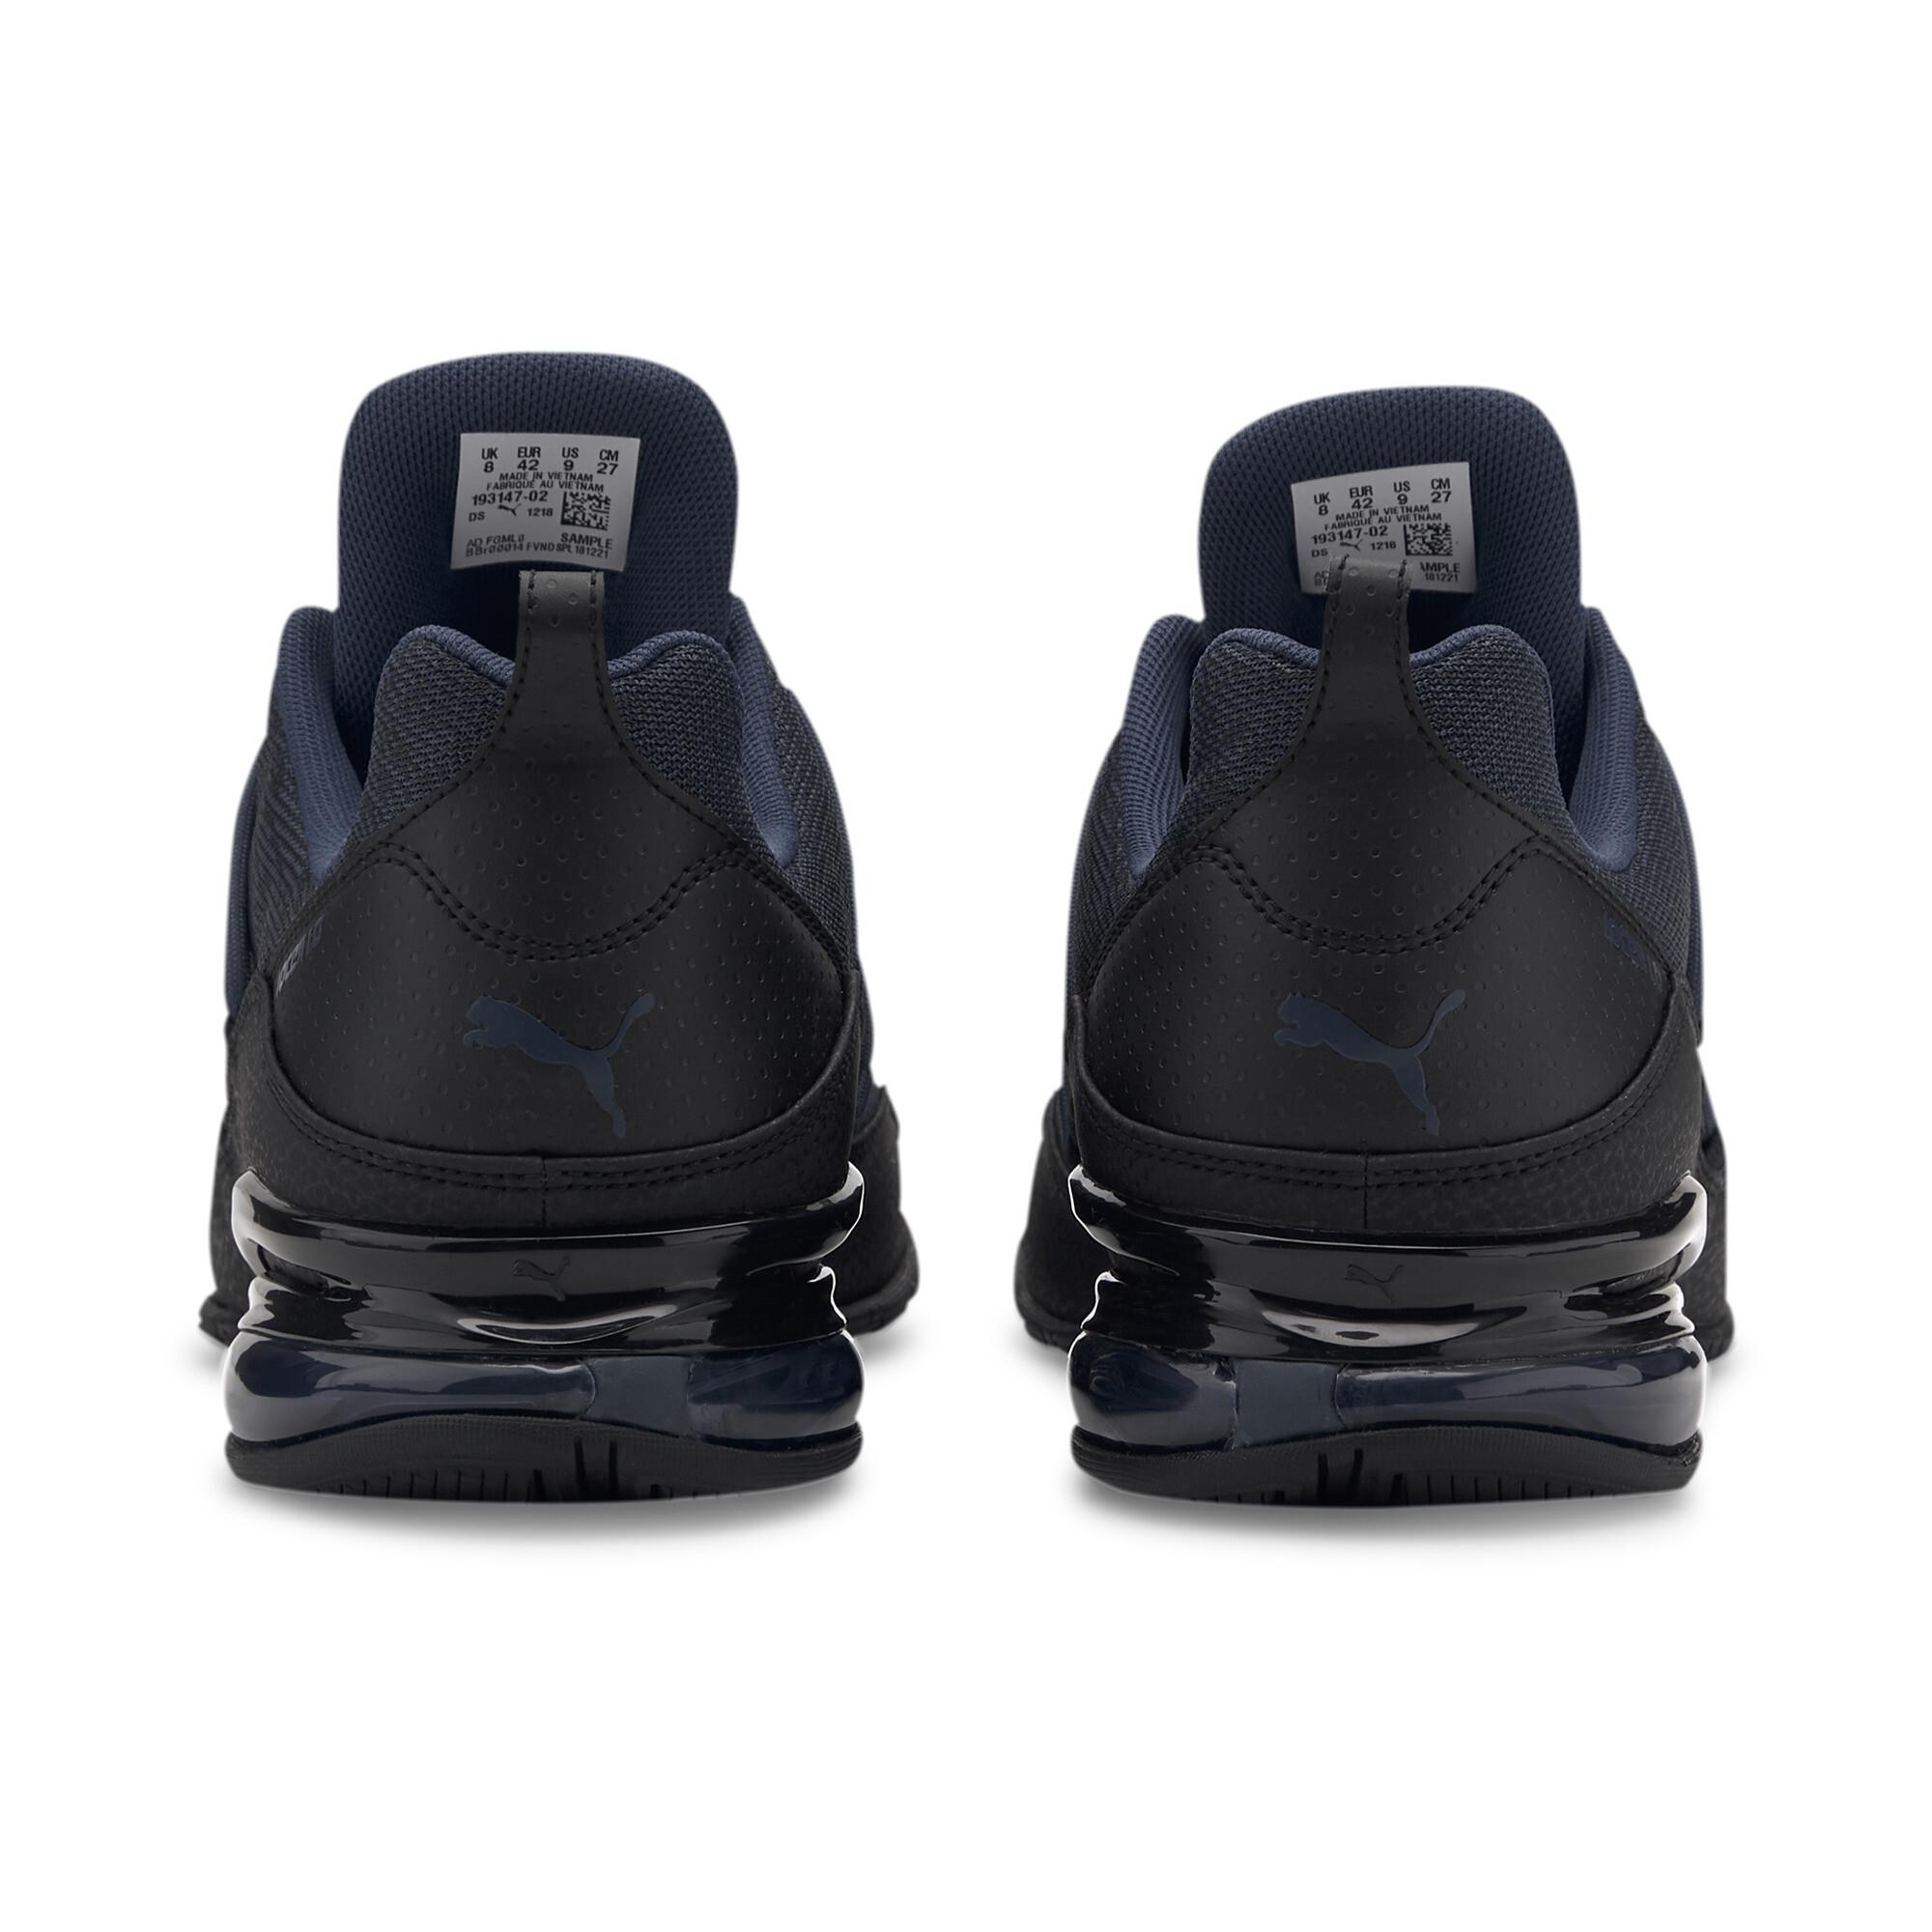 PUMA-Men-039-s-CELL-Regulate-Bold-Training-Shoes thumbnail 3